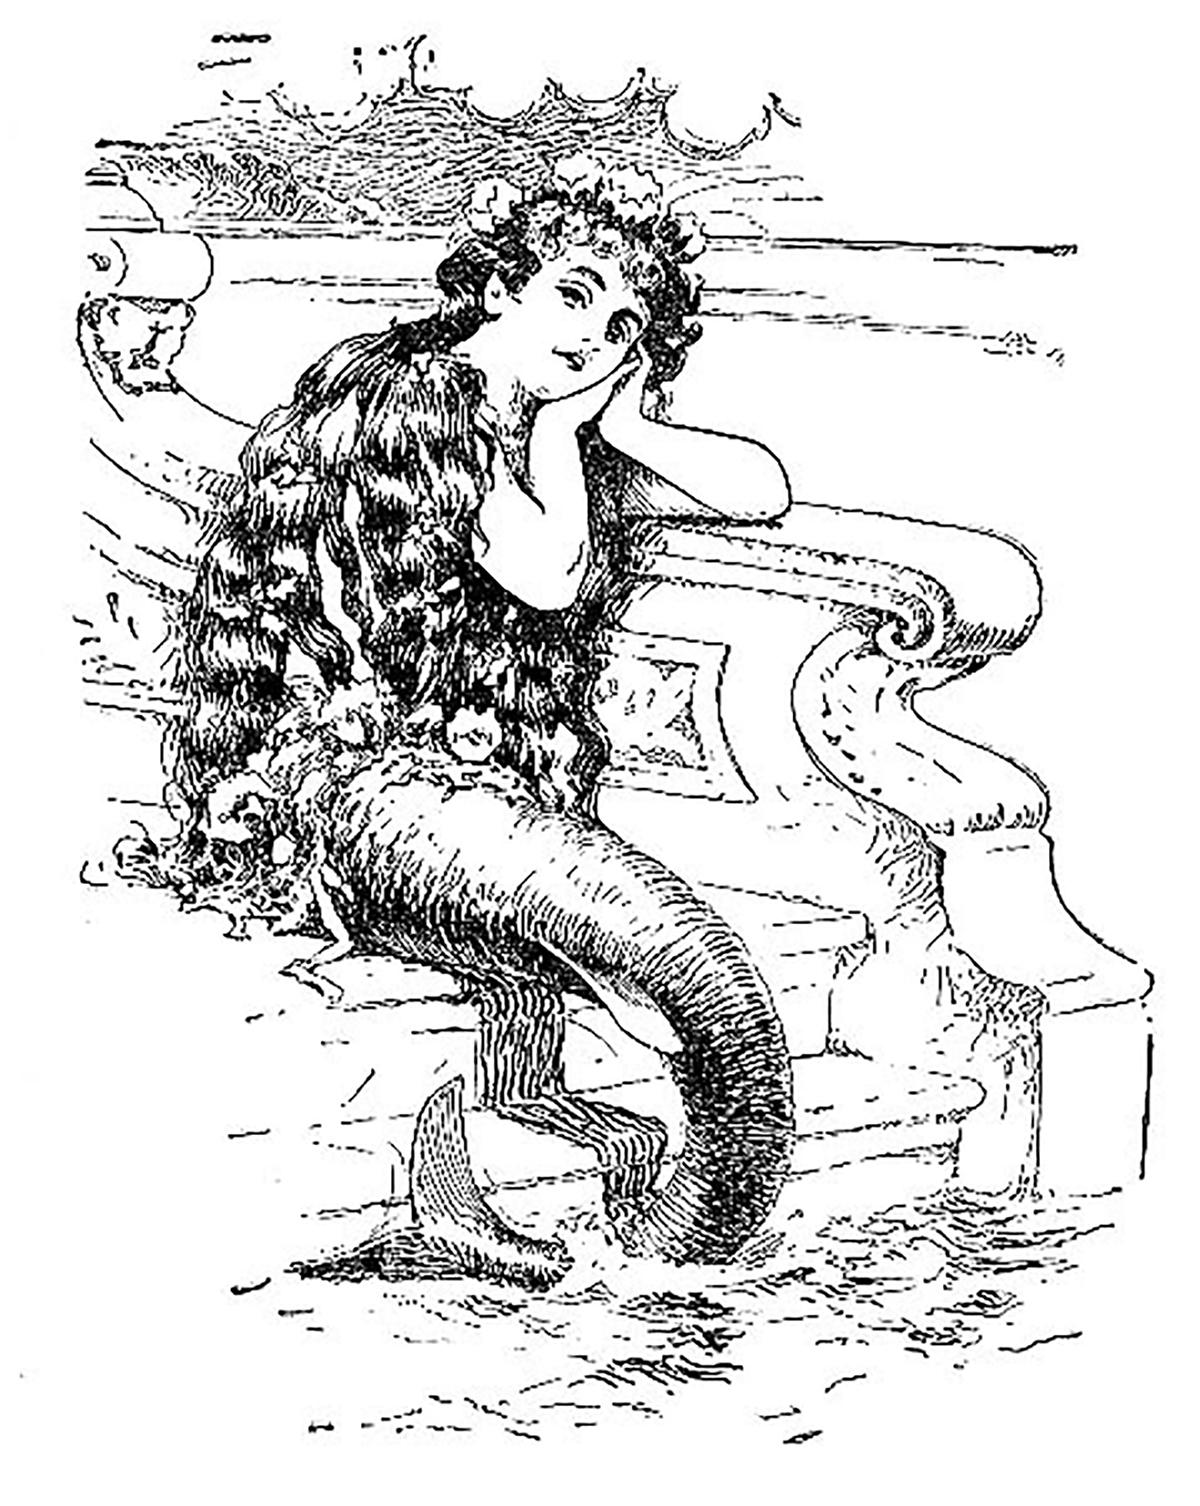 Mermaid on steps